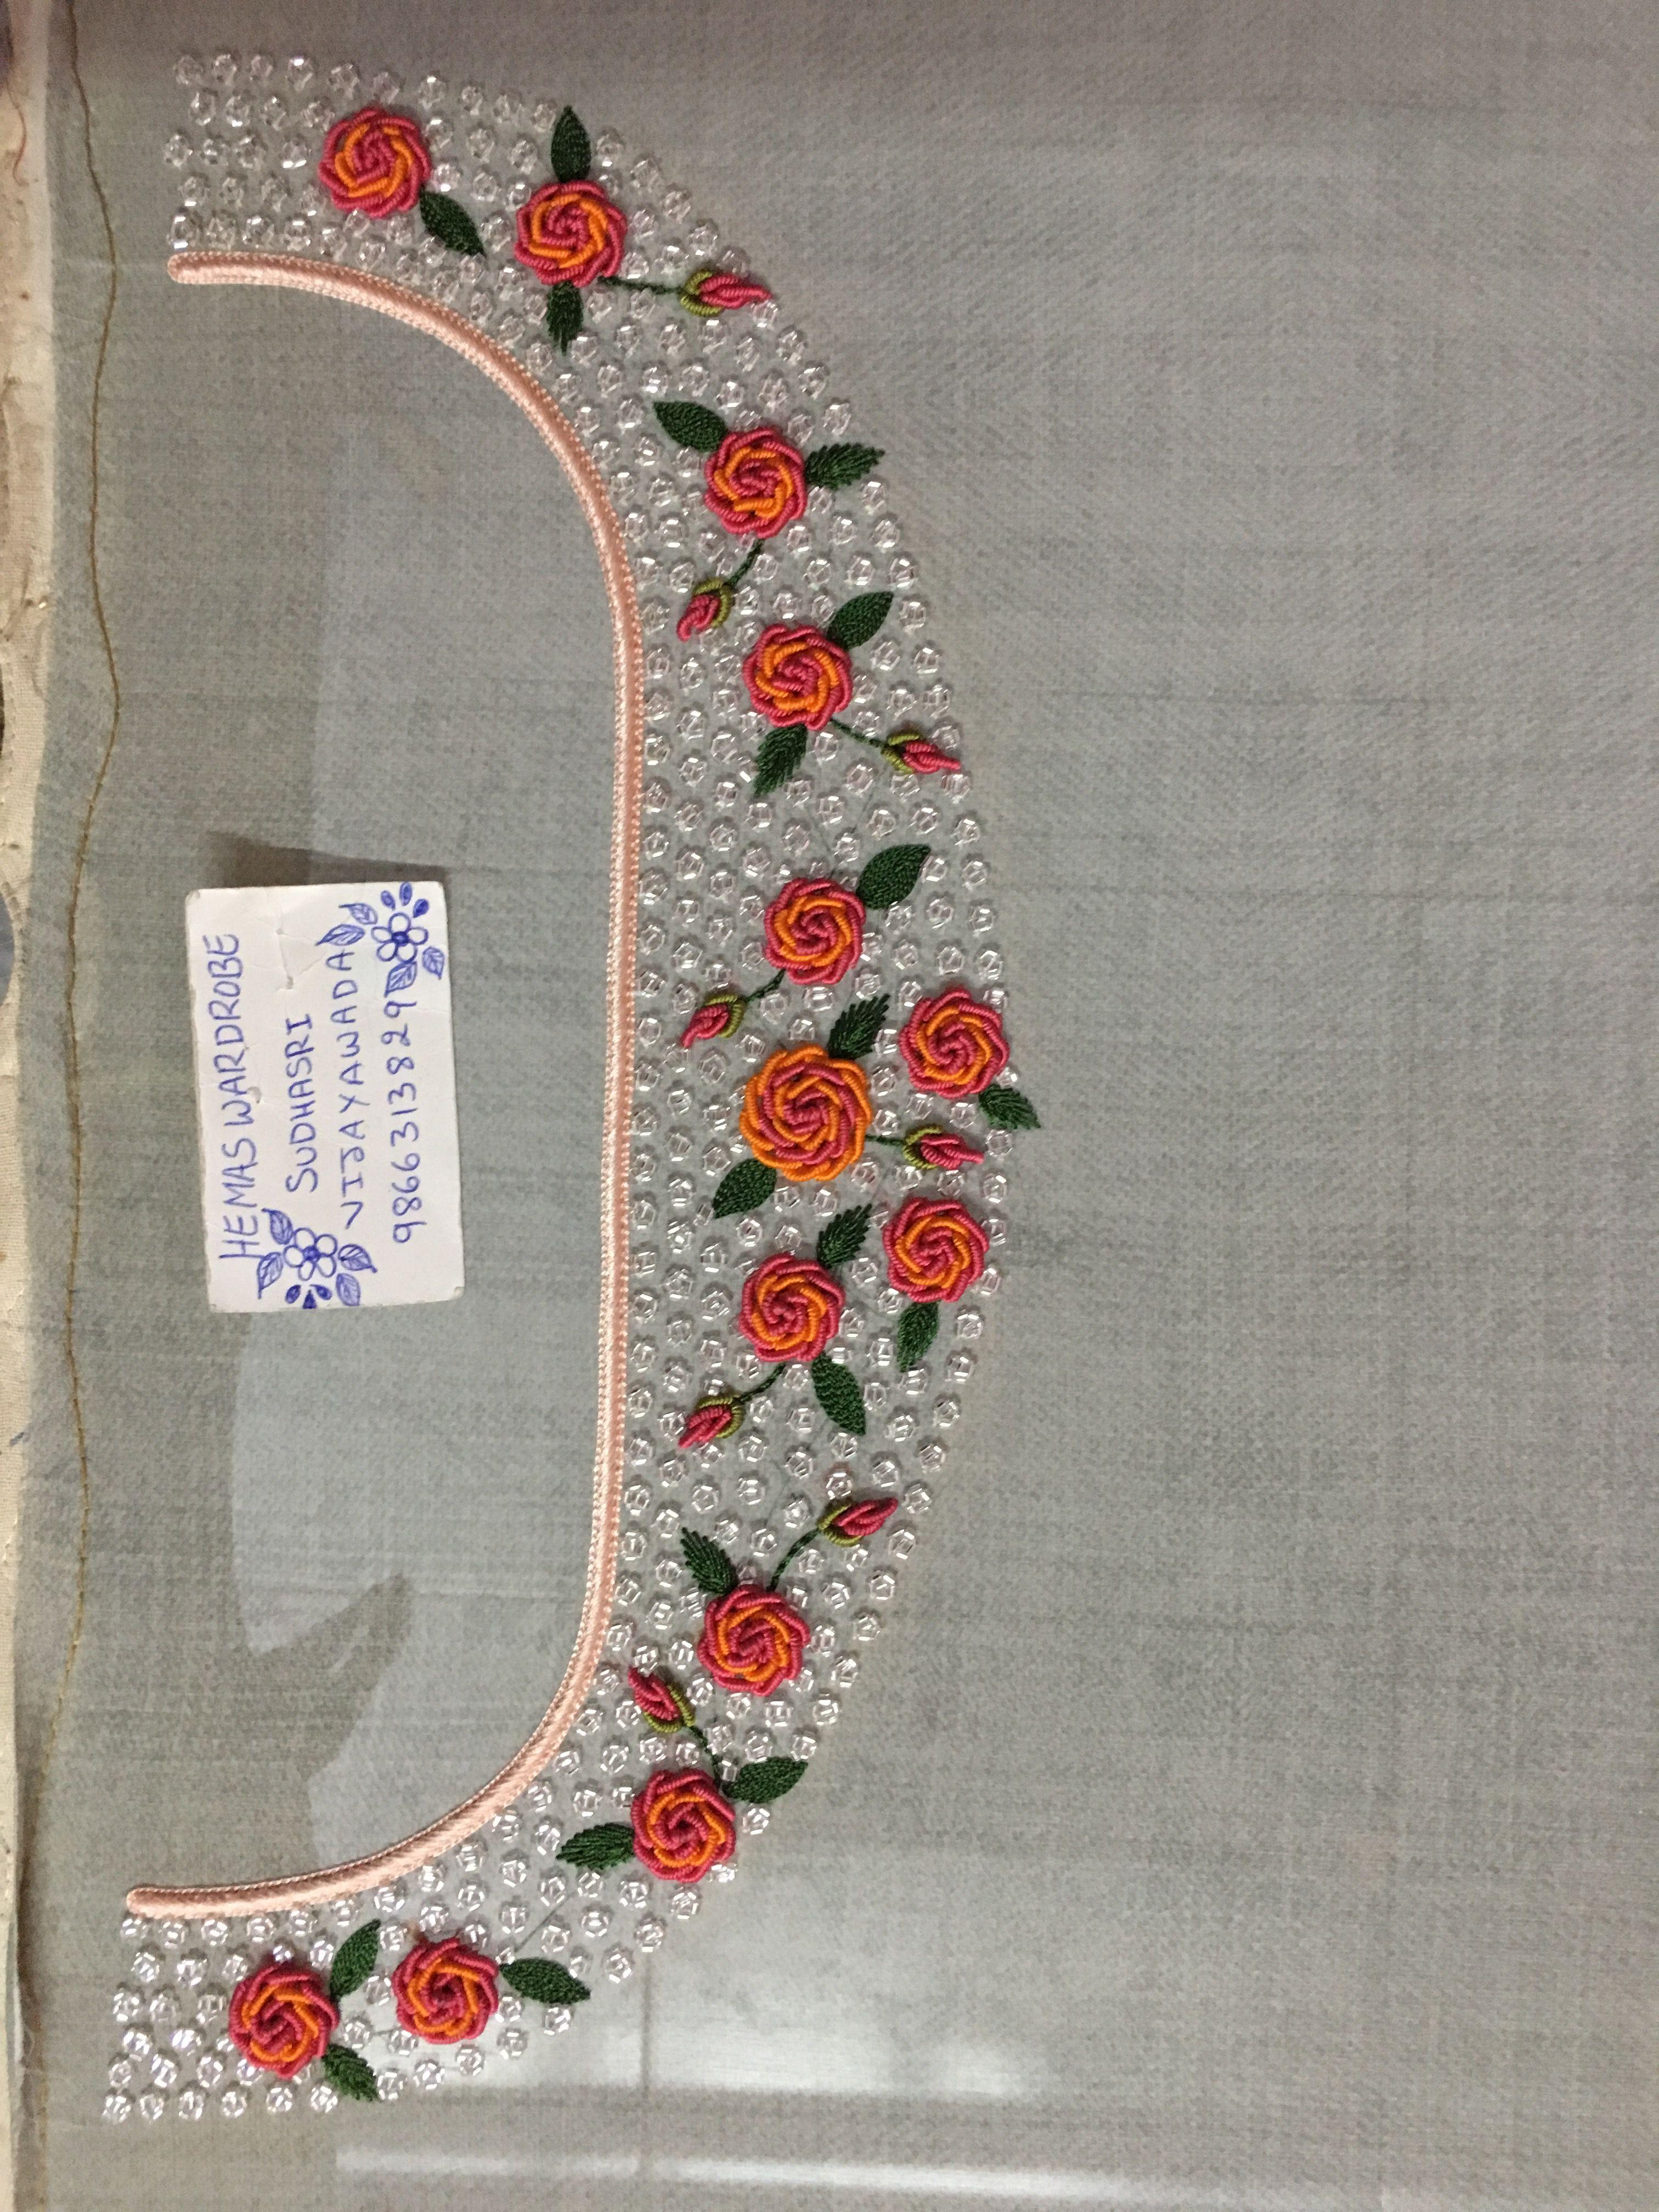 Sudhasri Hemaswardrobe Blouses Embroidery Blouse Designs Blouse